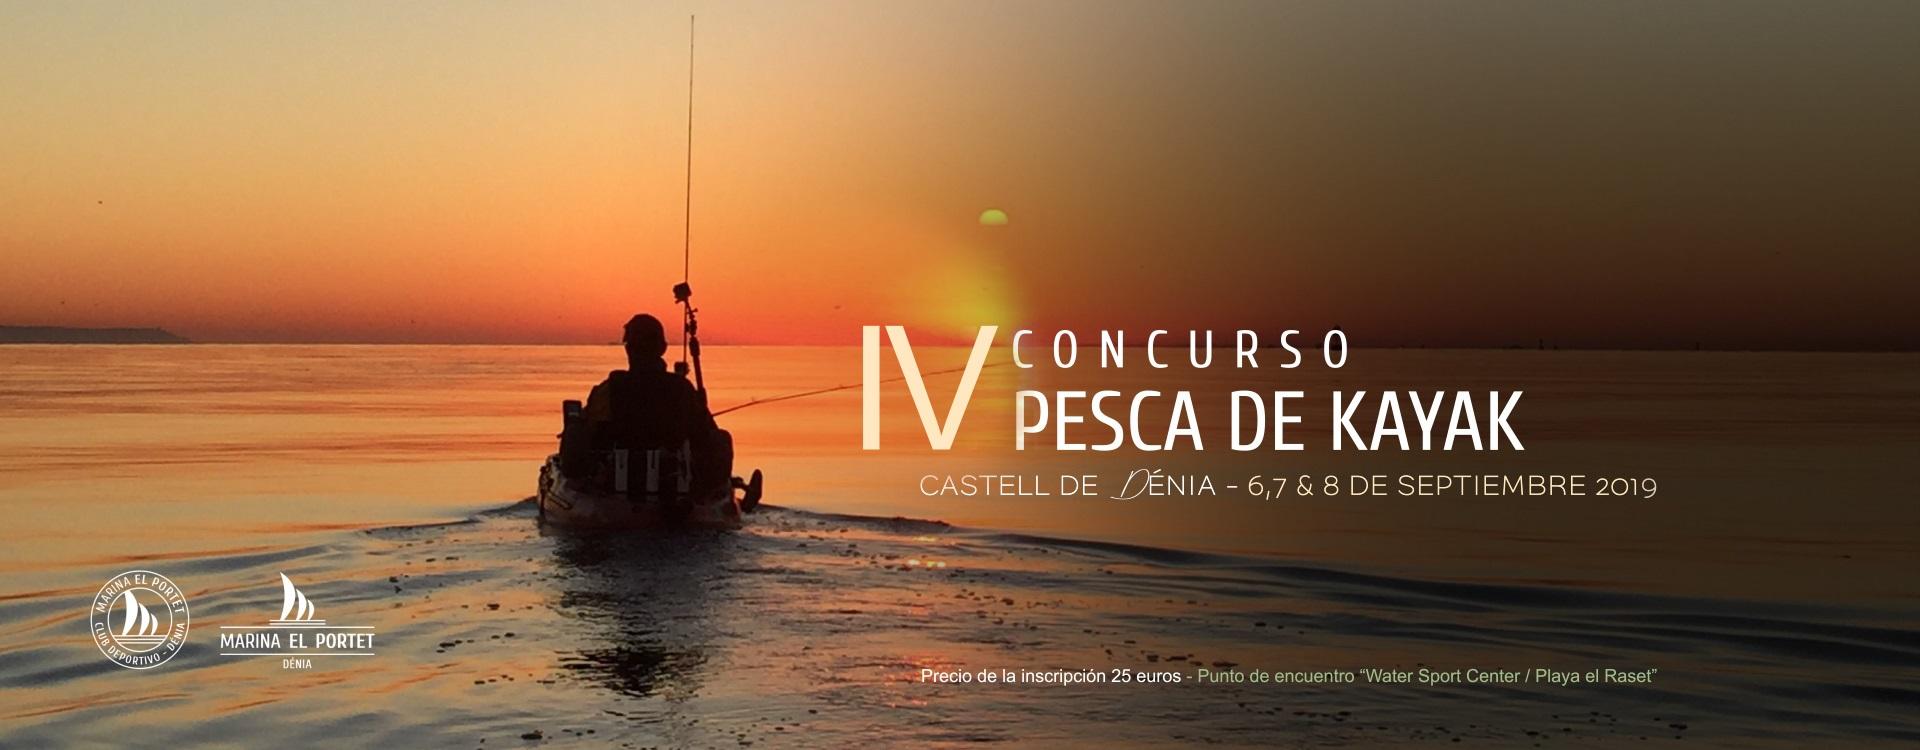 Joaquin Molpeceres II concurso de Pesca en Kayak Marina el Portet Denia